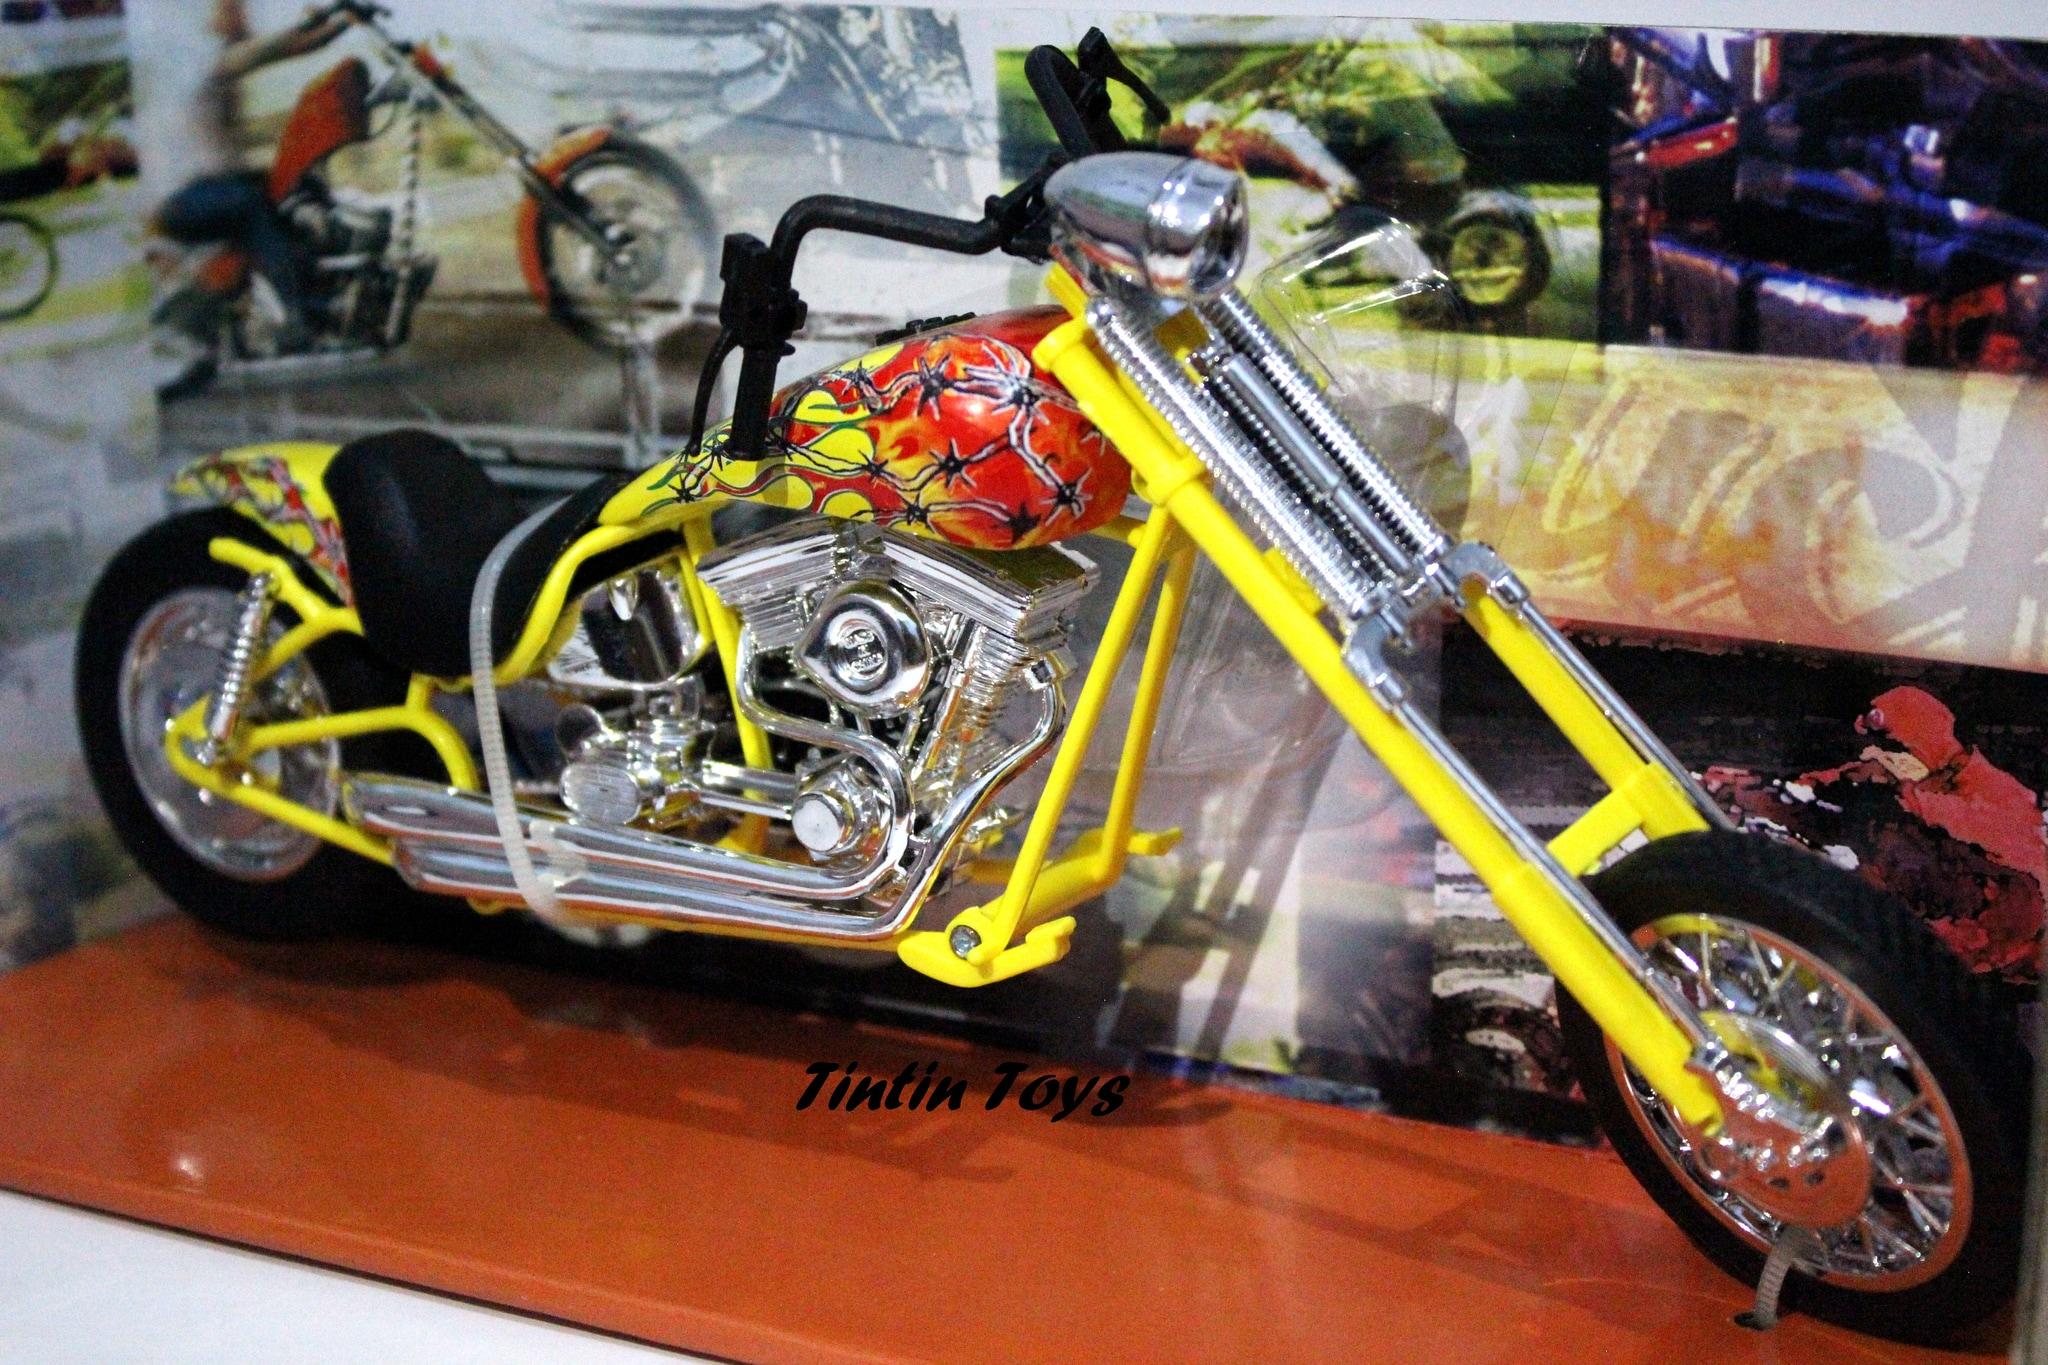 Jual Diecast Replika Motor Newray Choppers Custom Bike Yellow